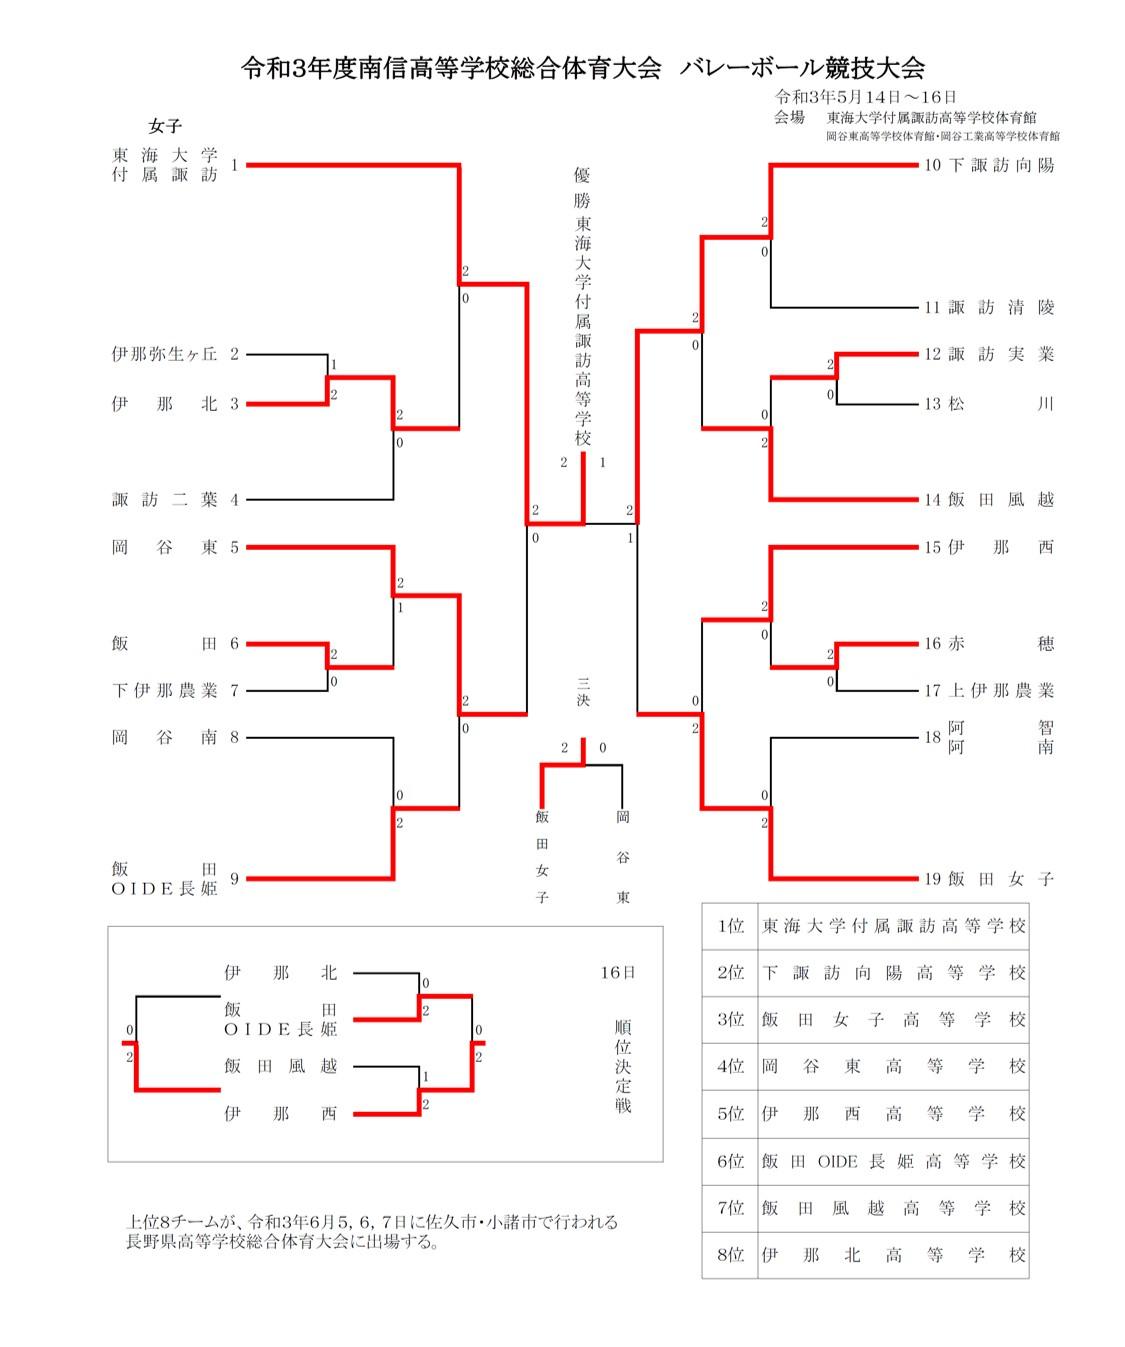 2021年度_インターハイ予選_長野県_南信地区_女子_結果